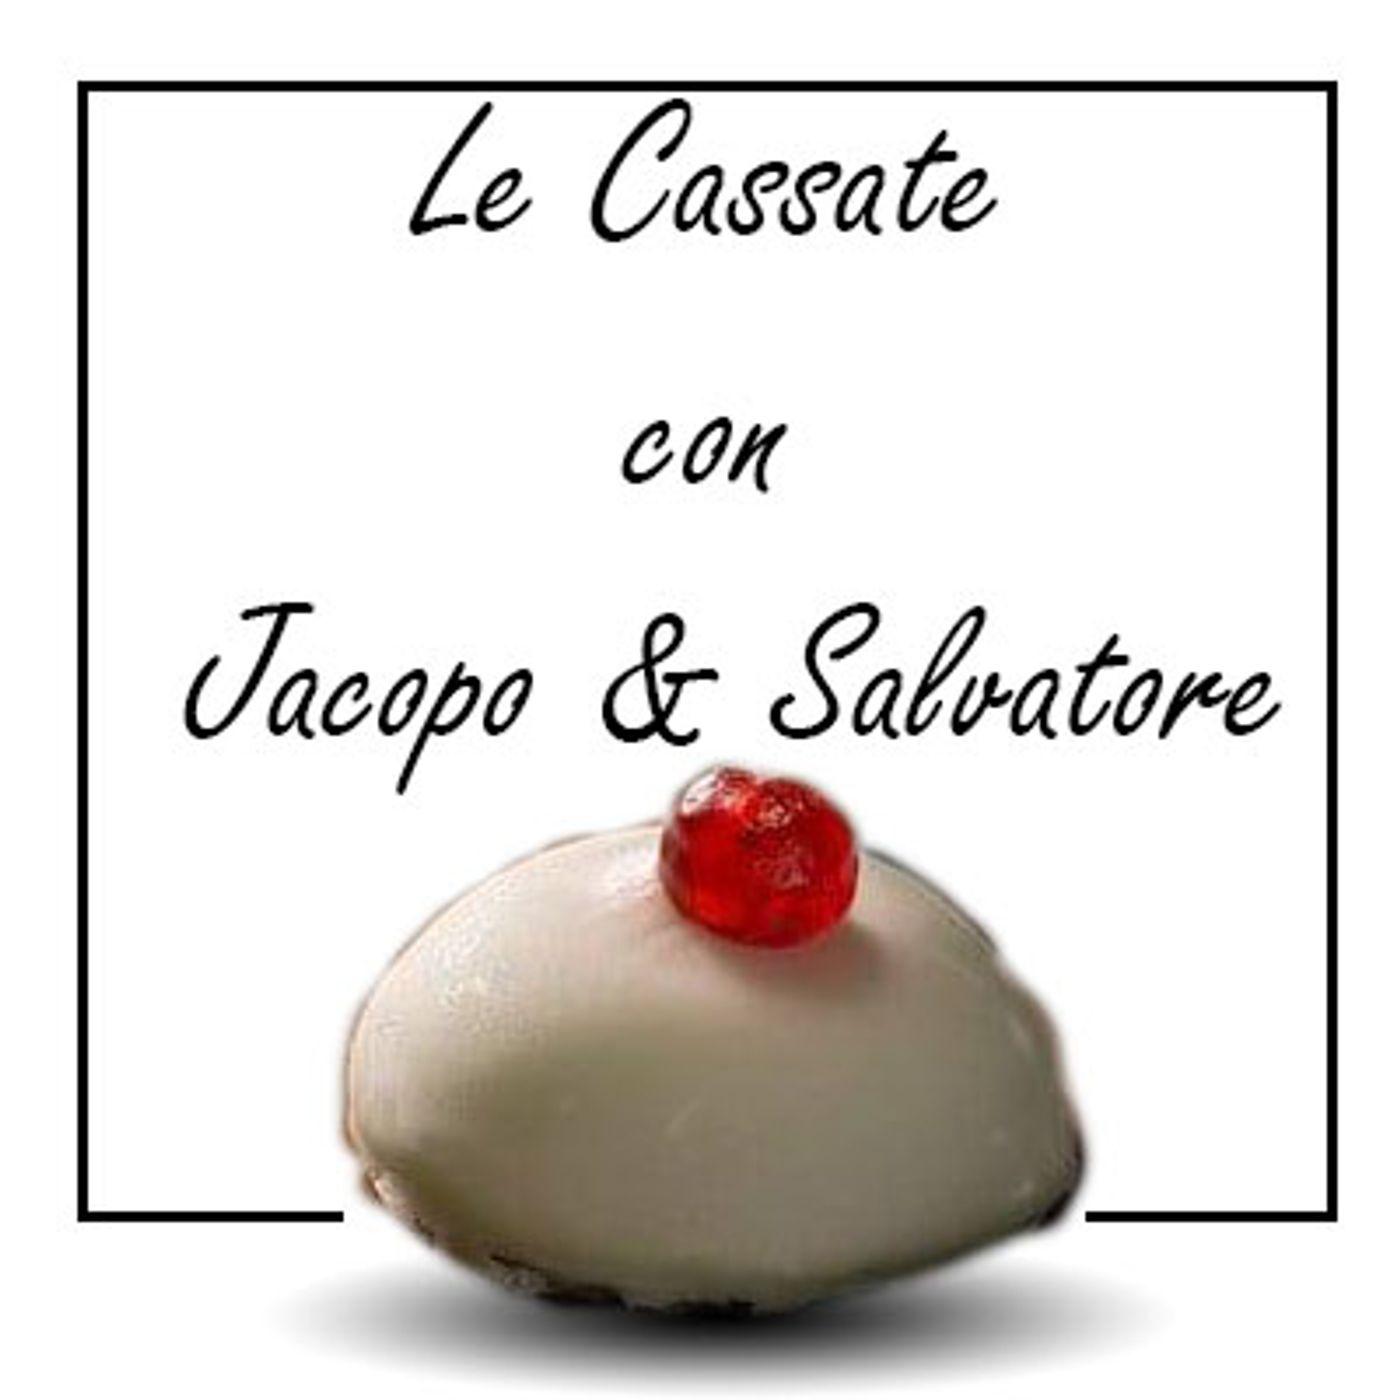 Speciale Le Cassate giovediane